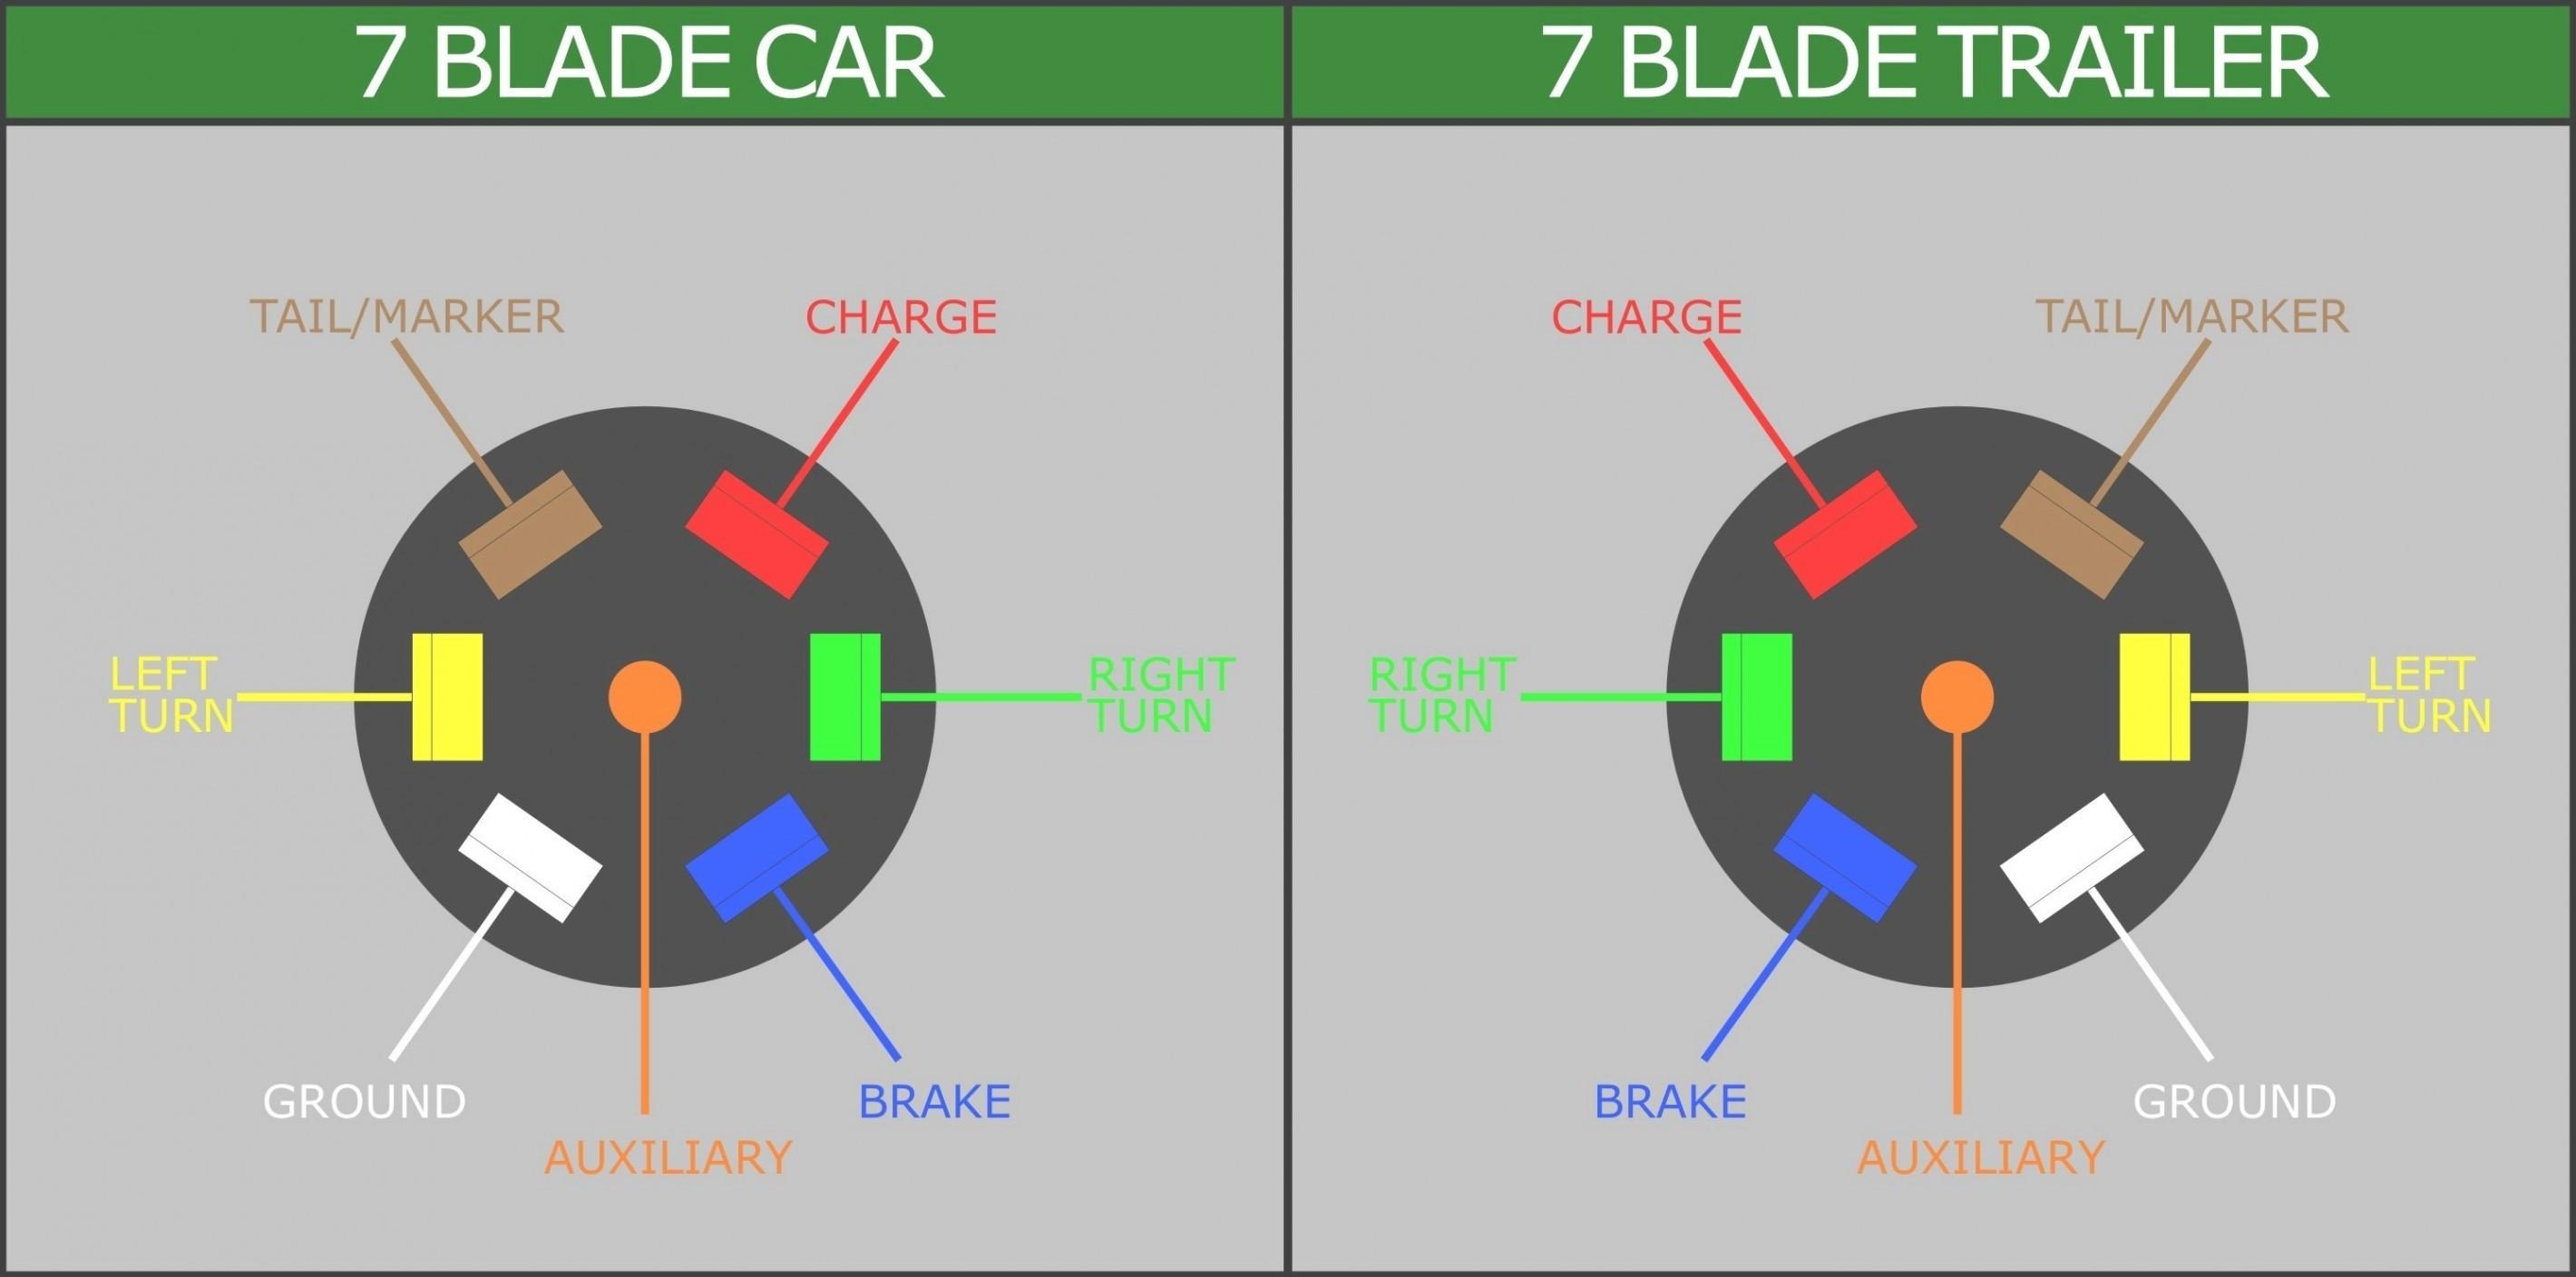 7 Way Trailer Plug Wiring Diagram Gmc Best 7 Way Trailer Plug Wiring  Diagram Gmc –